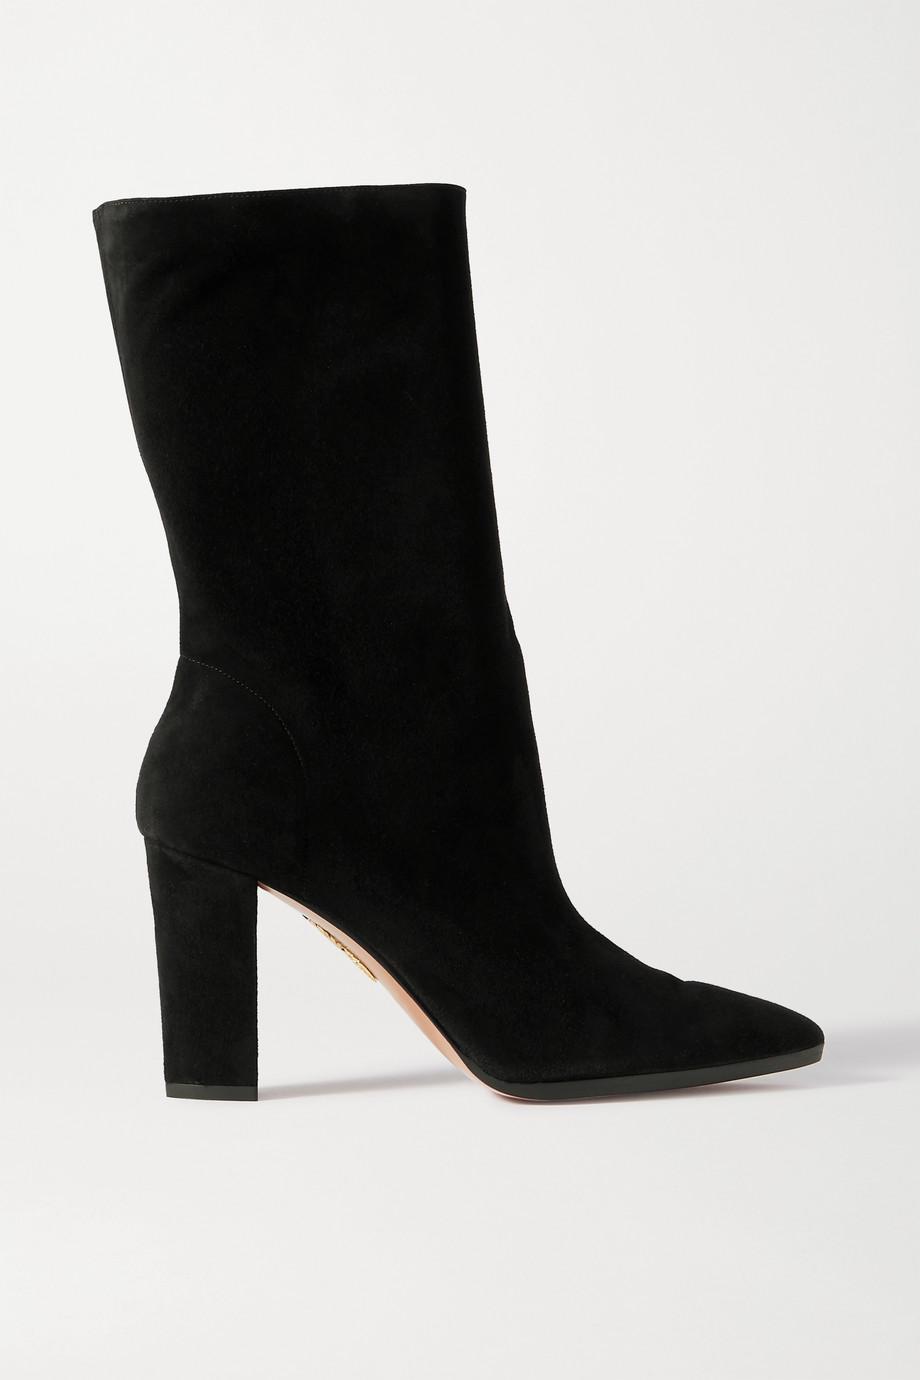 Aquazzura Skyler suede boots